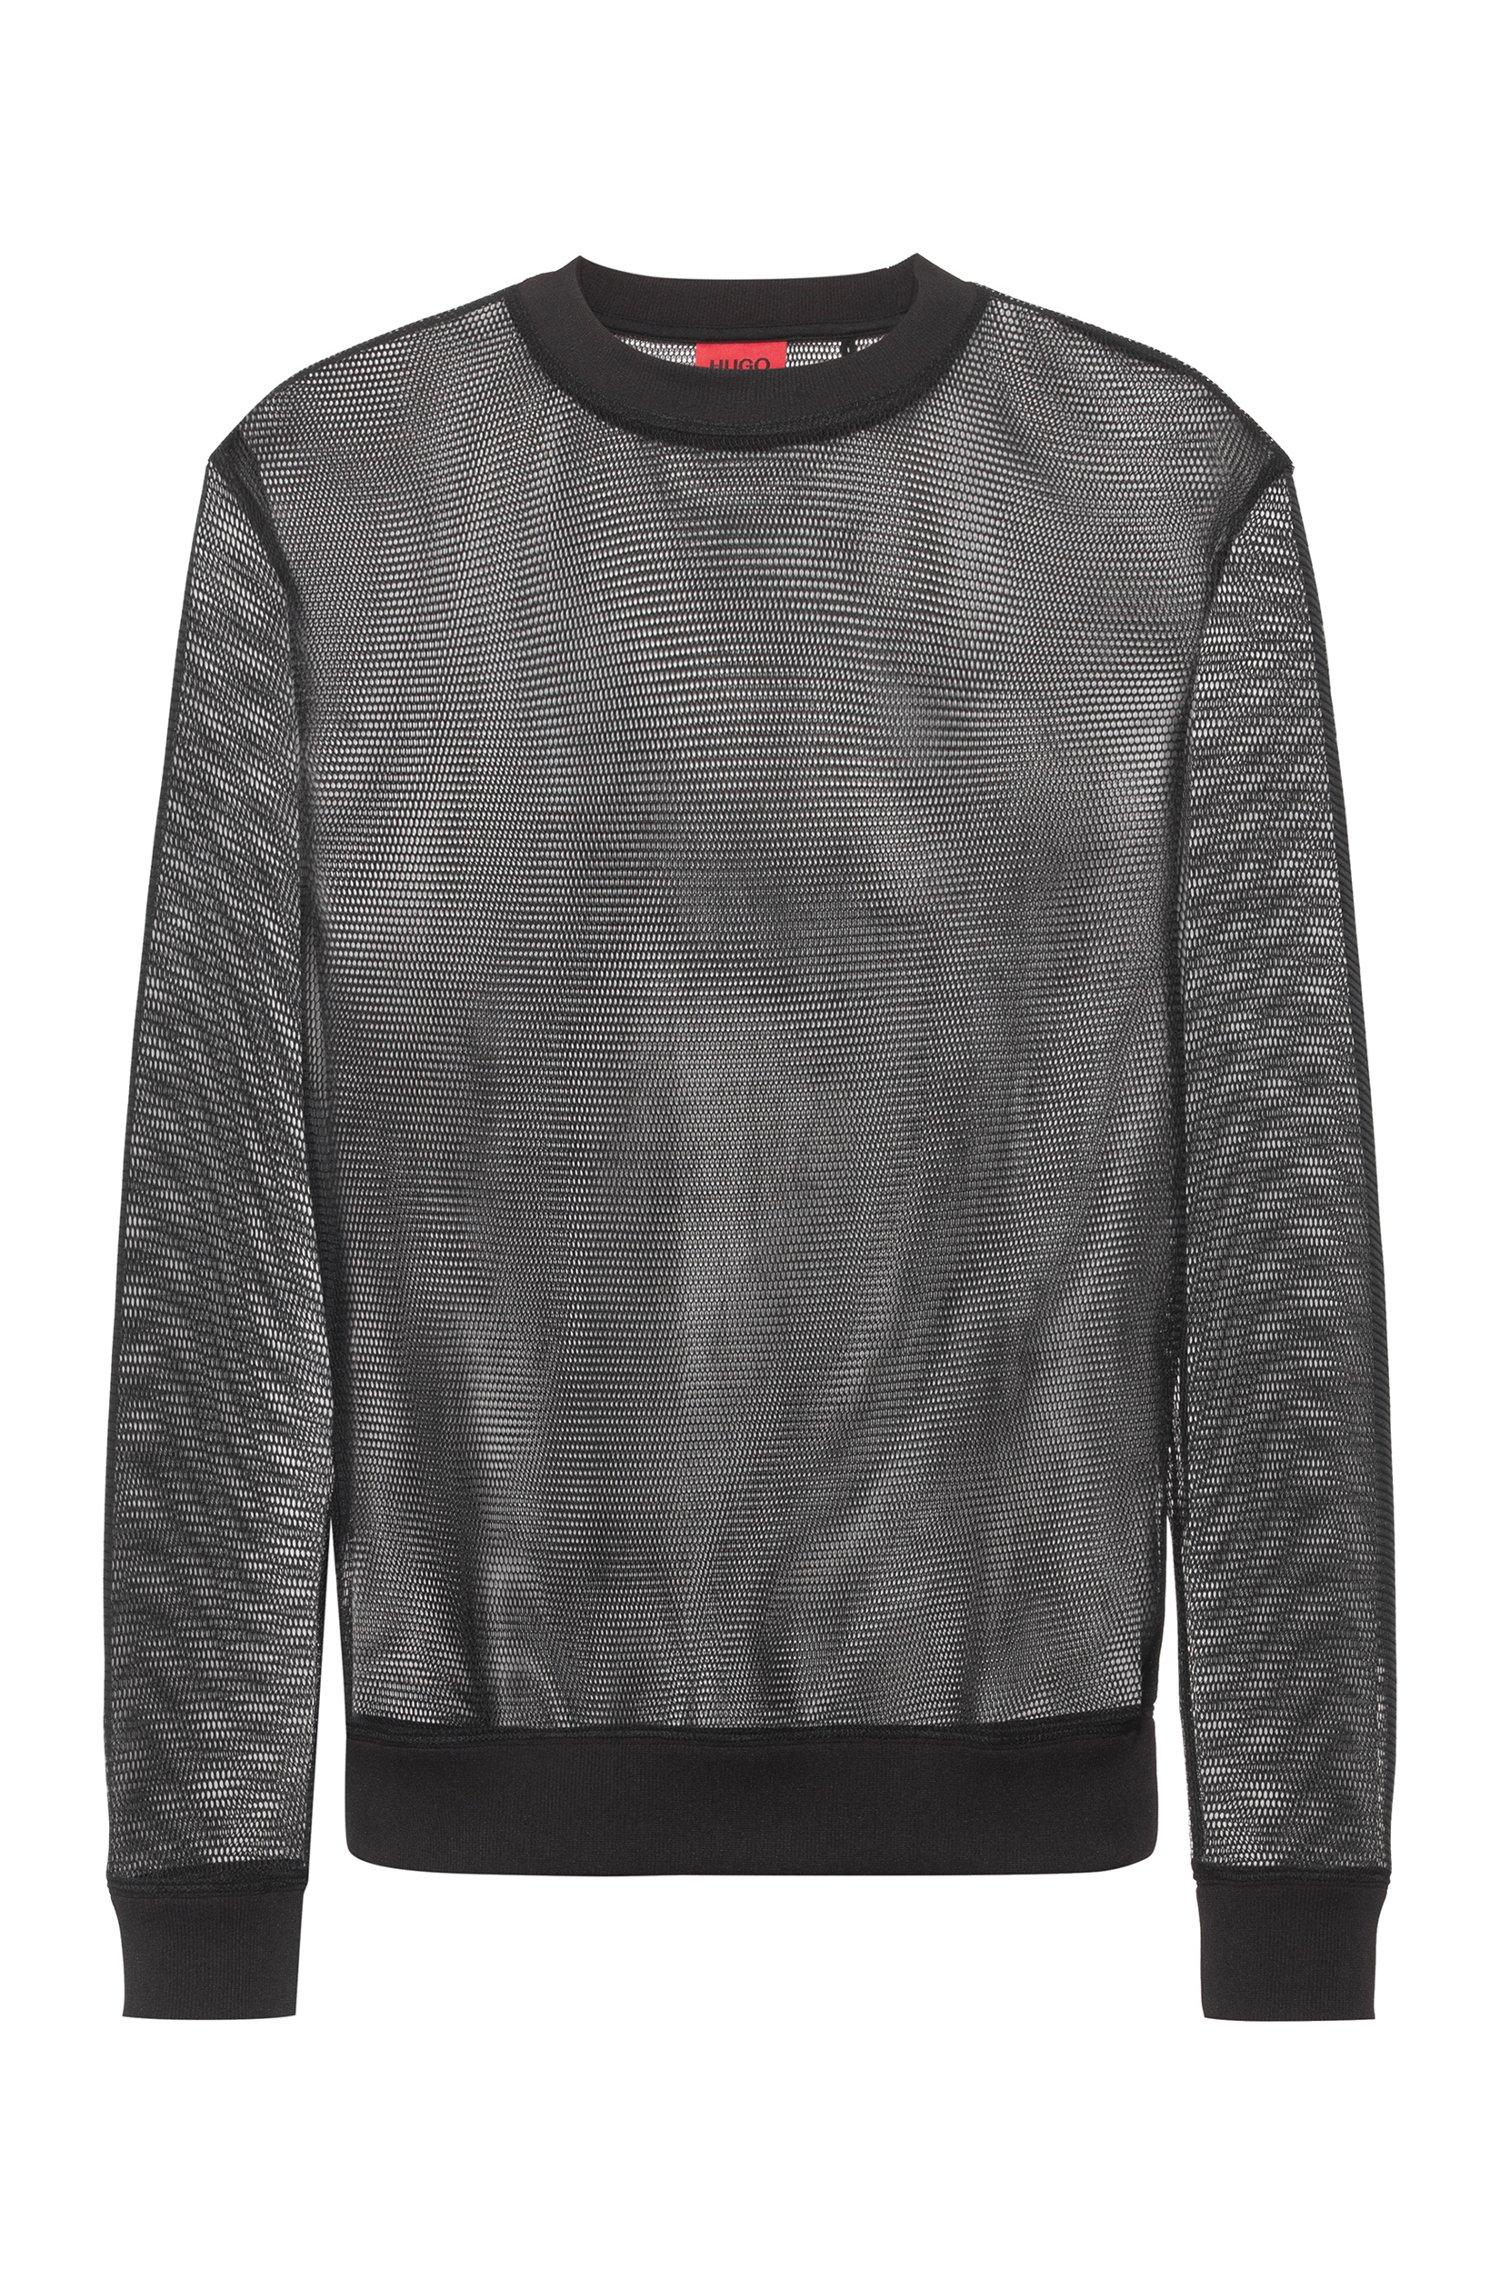 Regular-fit sweatshirt in transparent mesh, Black